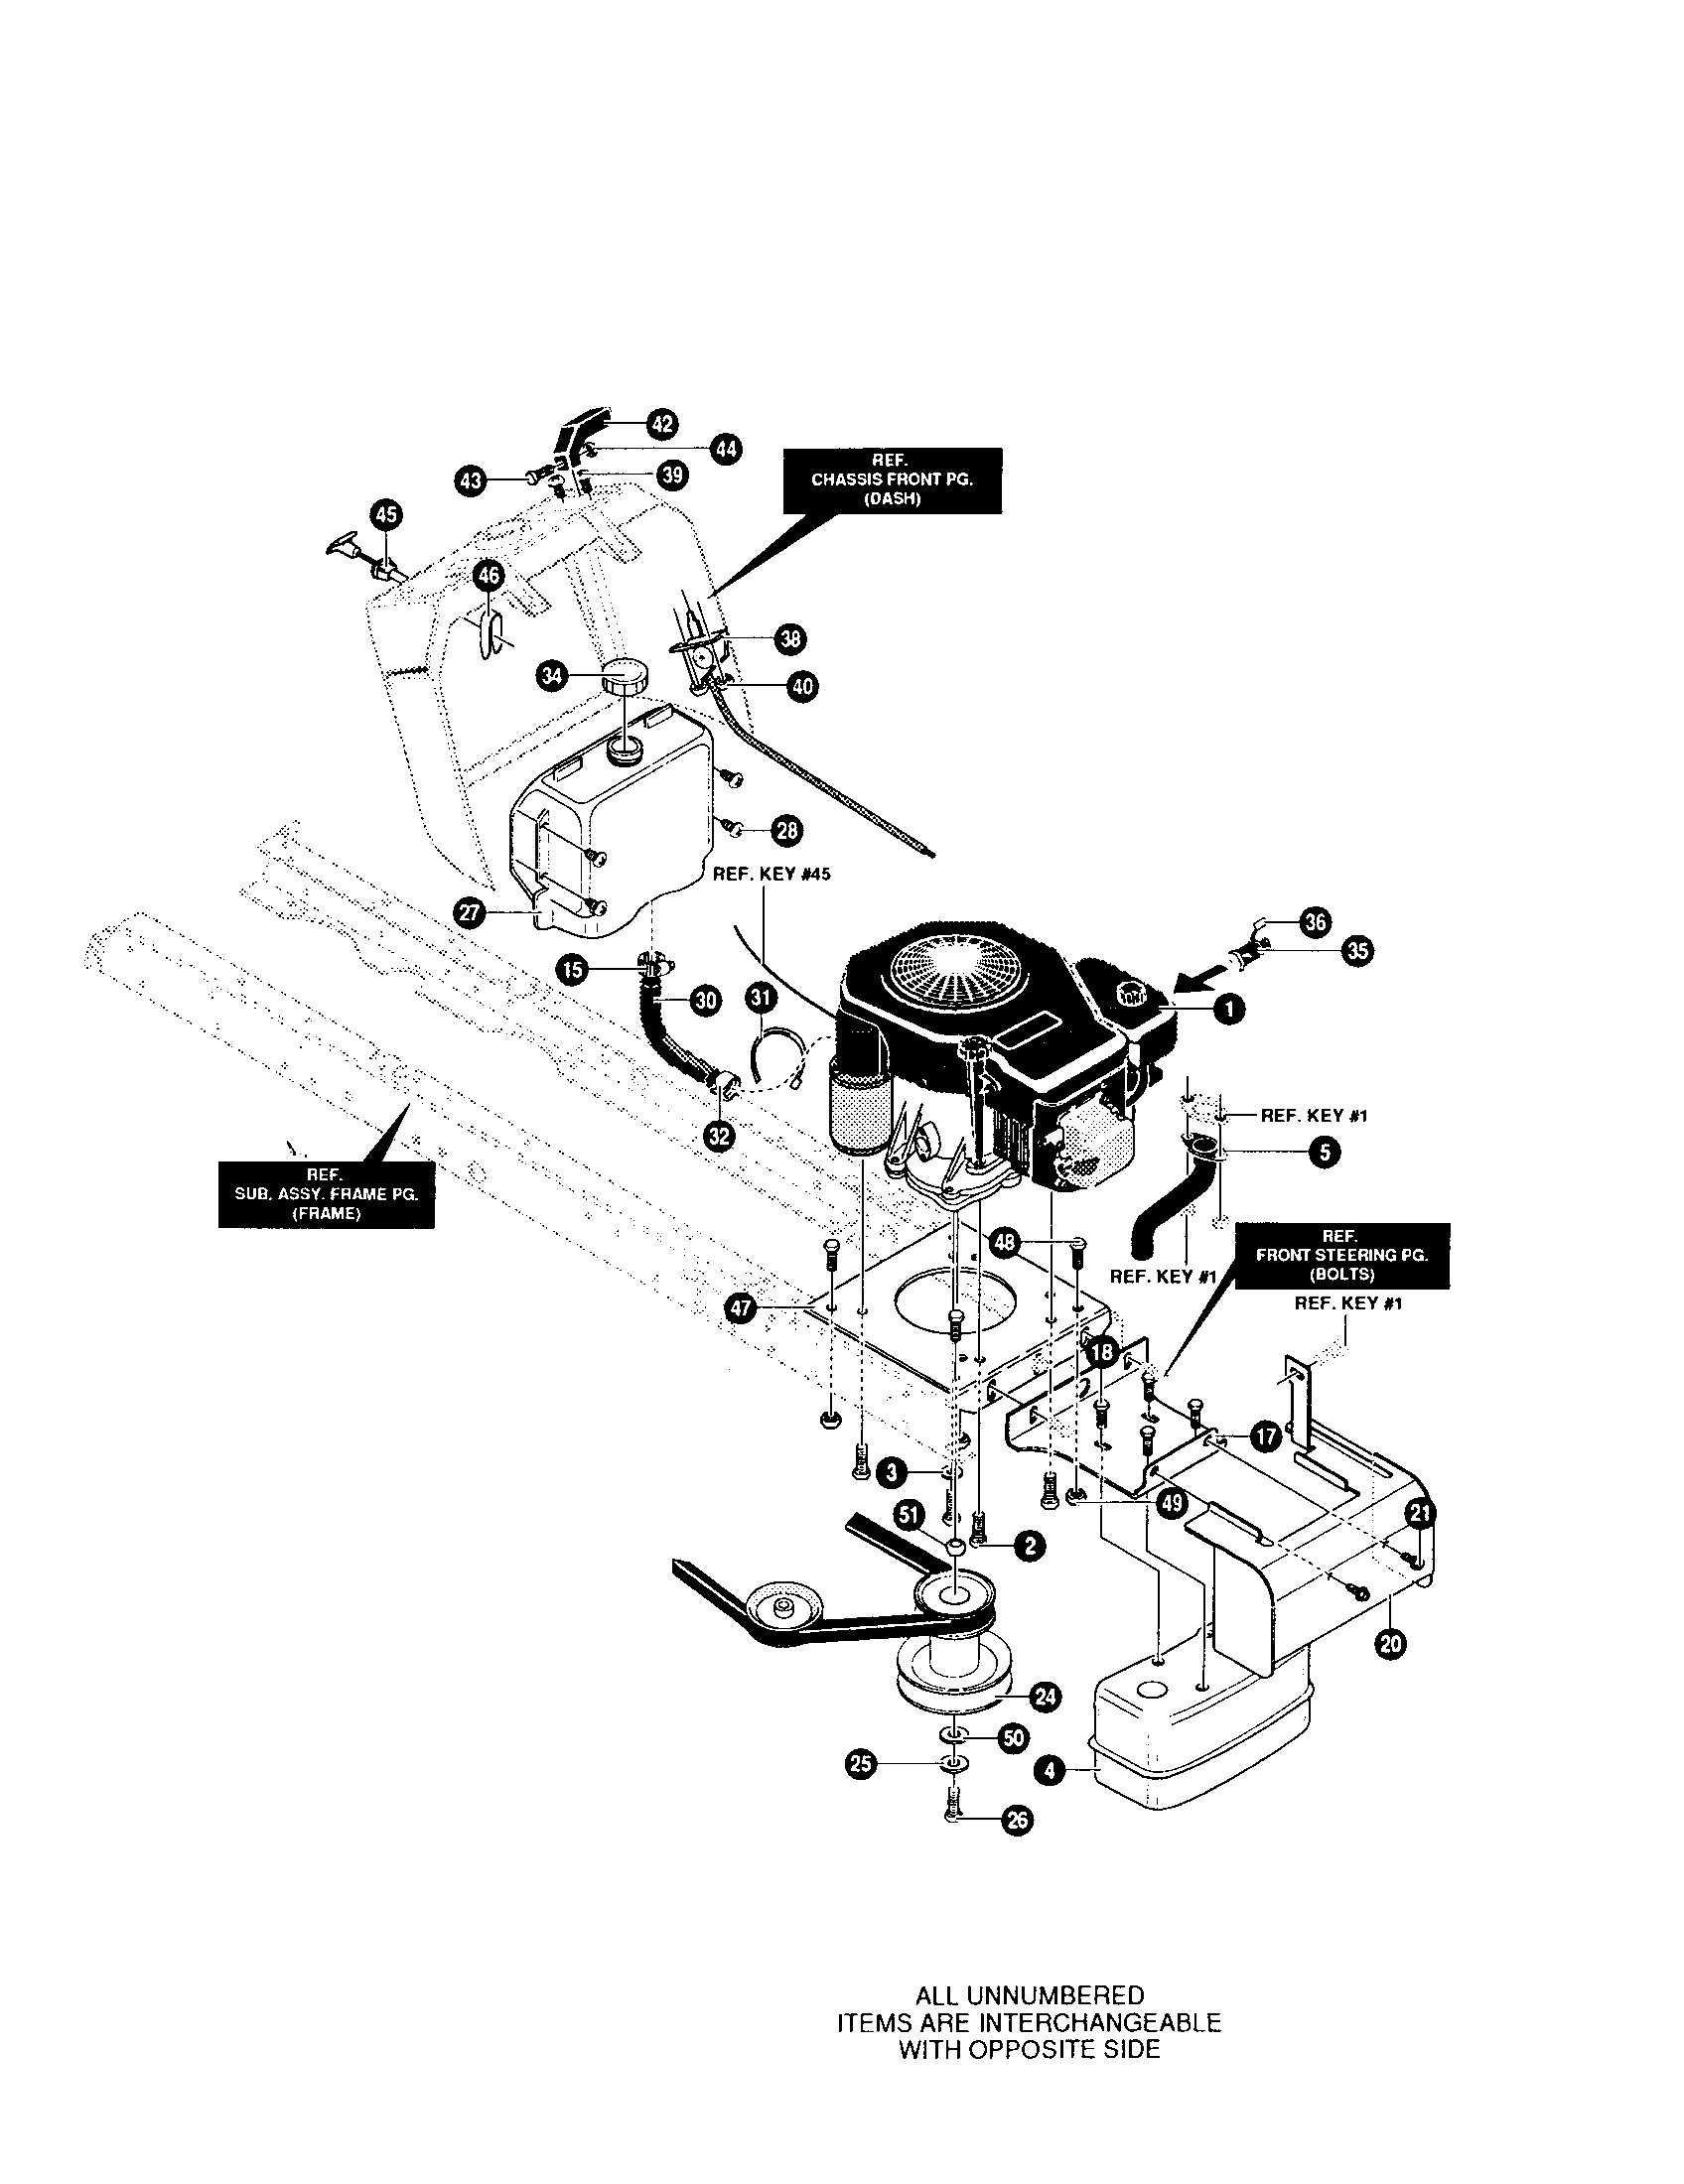 20 Hp Kohler Engine Wiring Diagram Motor Parts Kohler Motor Parts Of 20 Hp Kohler Engine Wiring Diagram